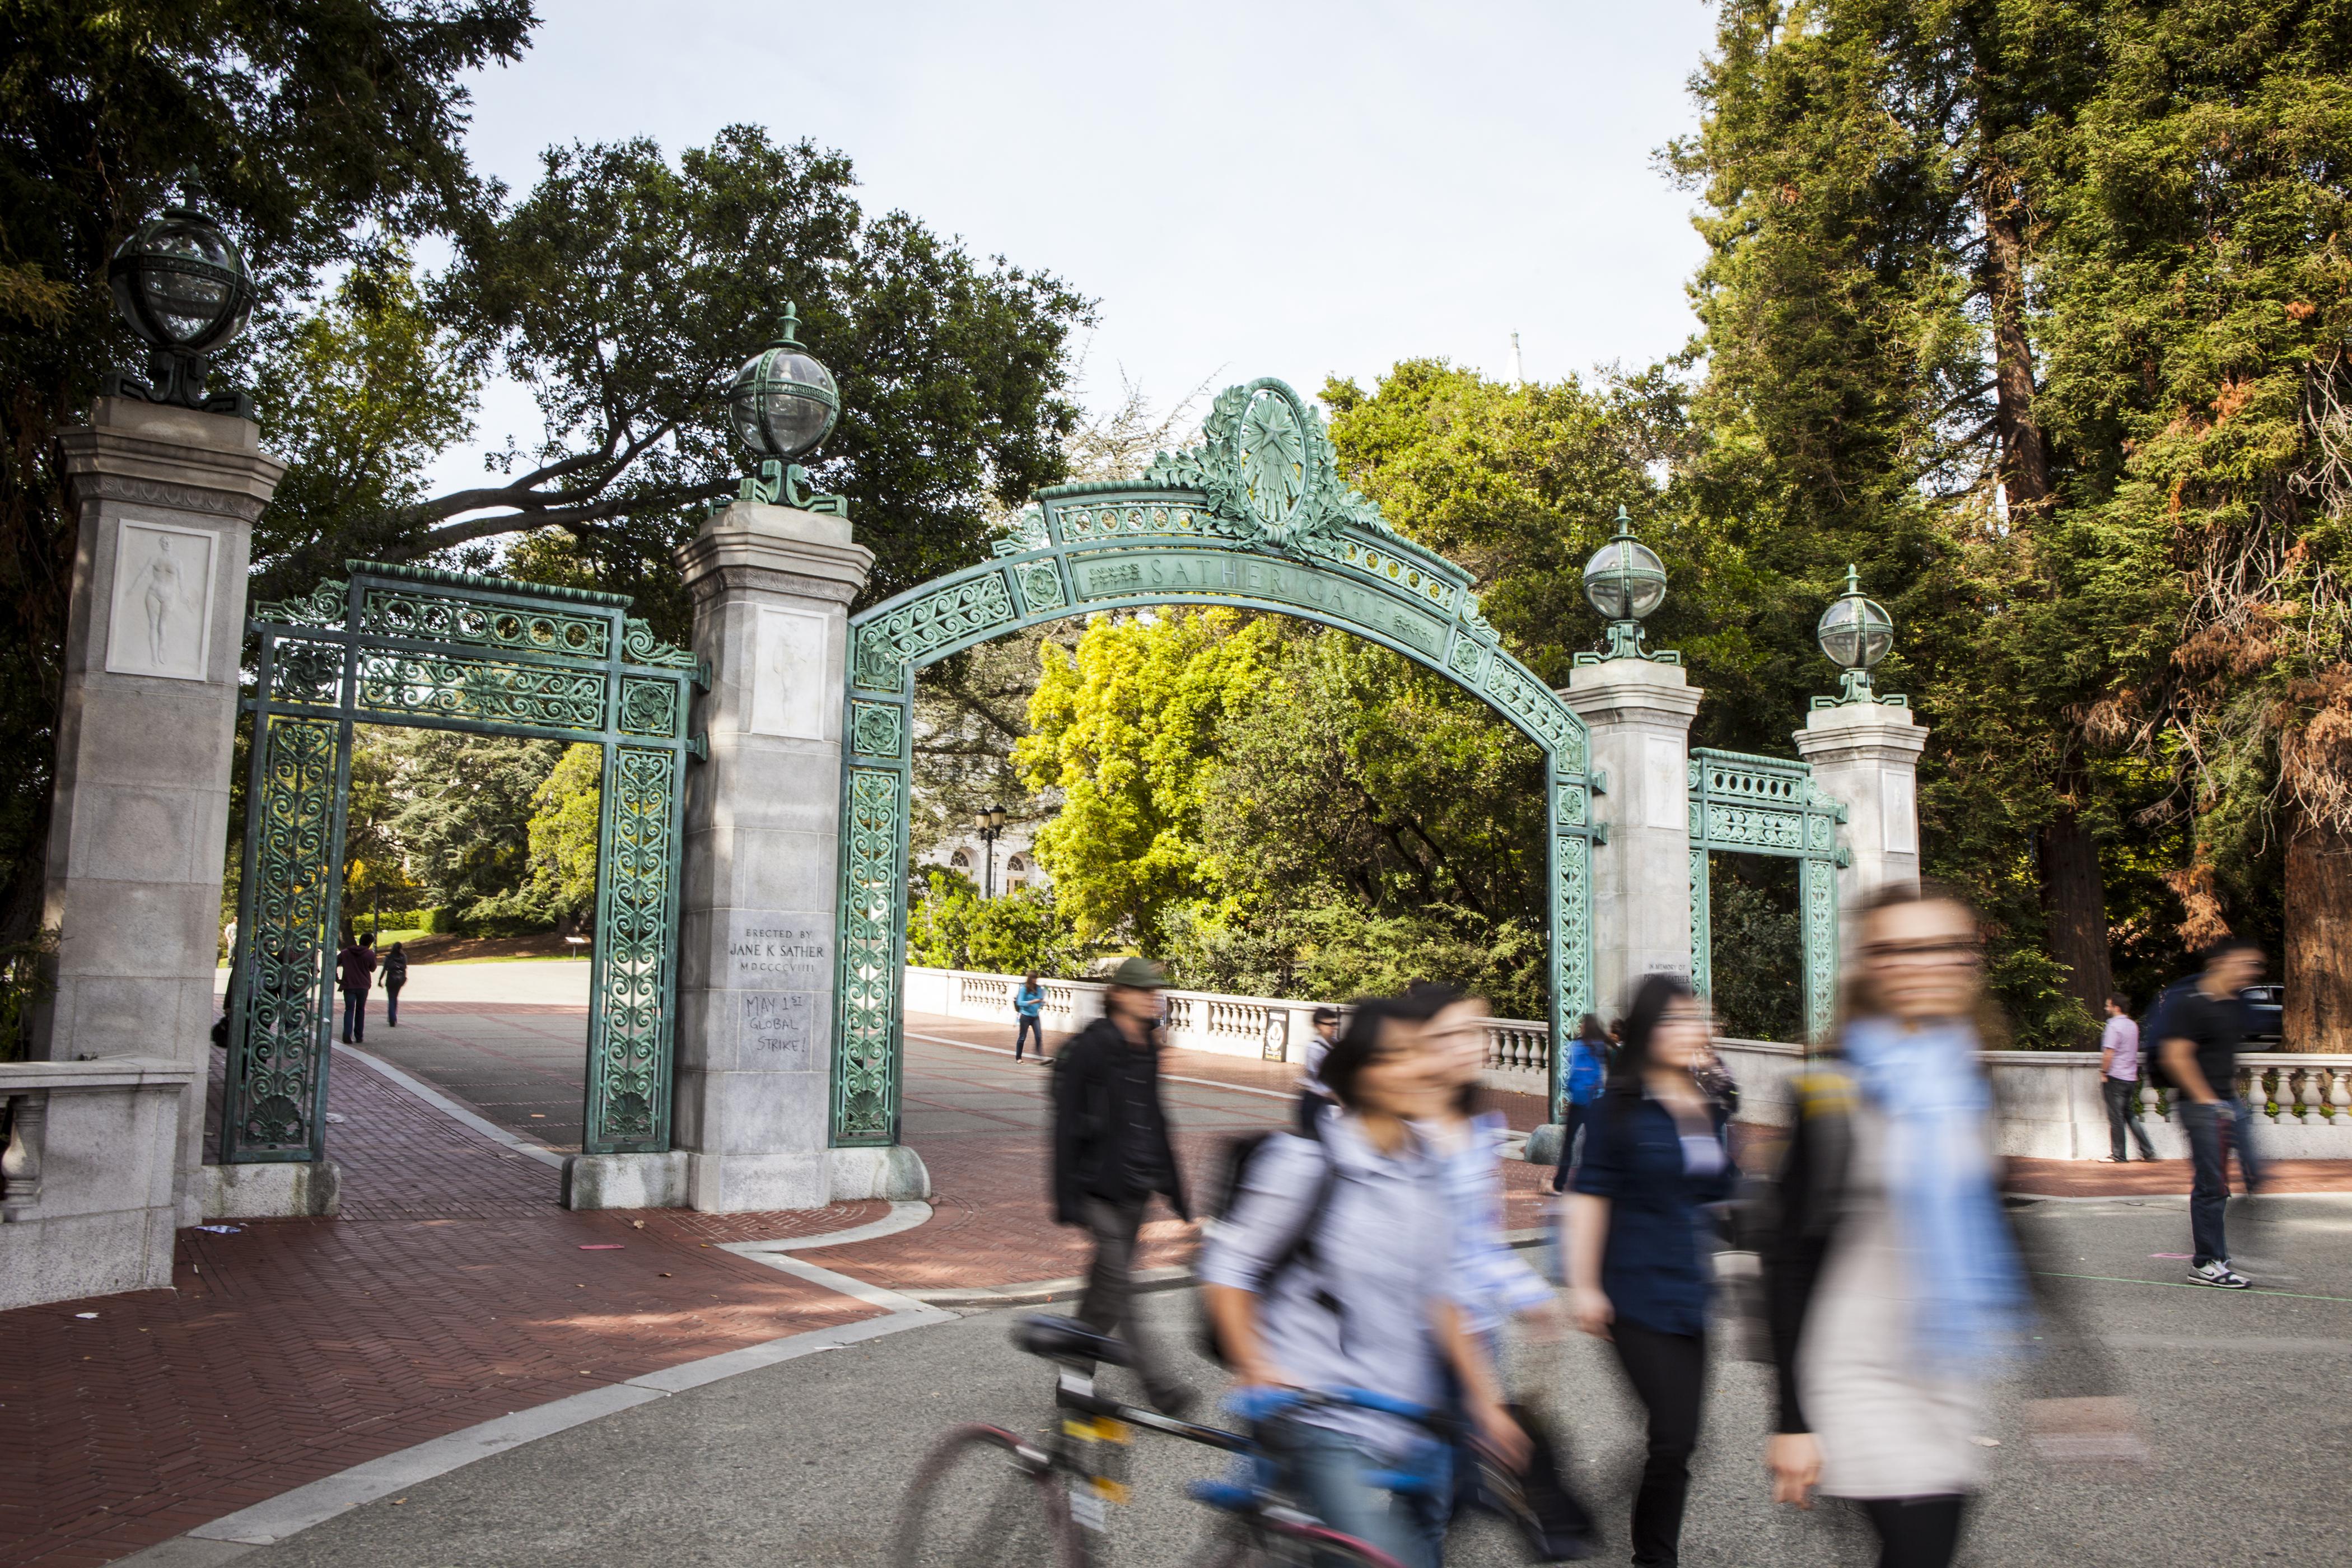 On campus at UC Berkeley